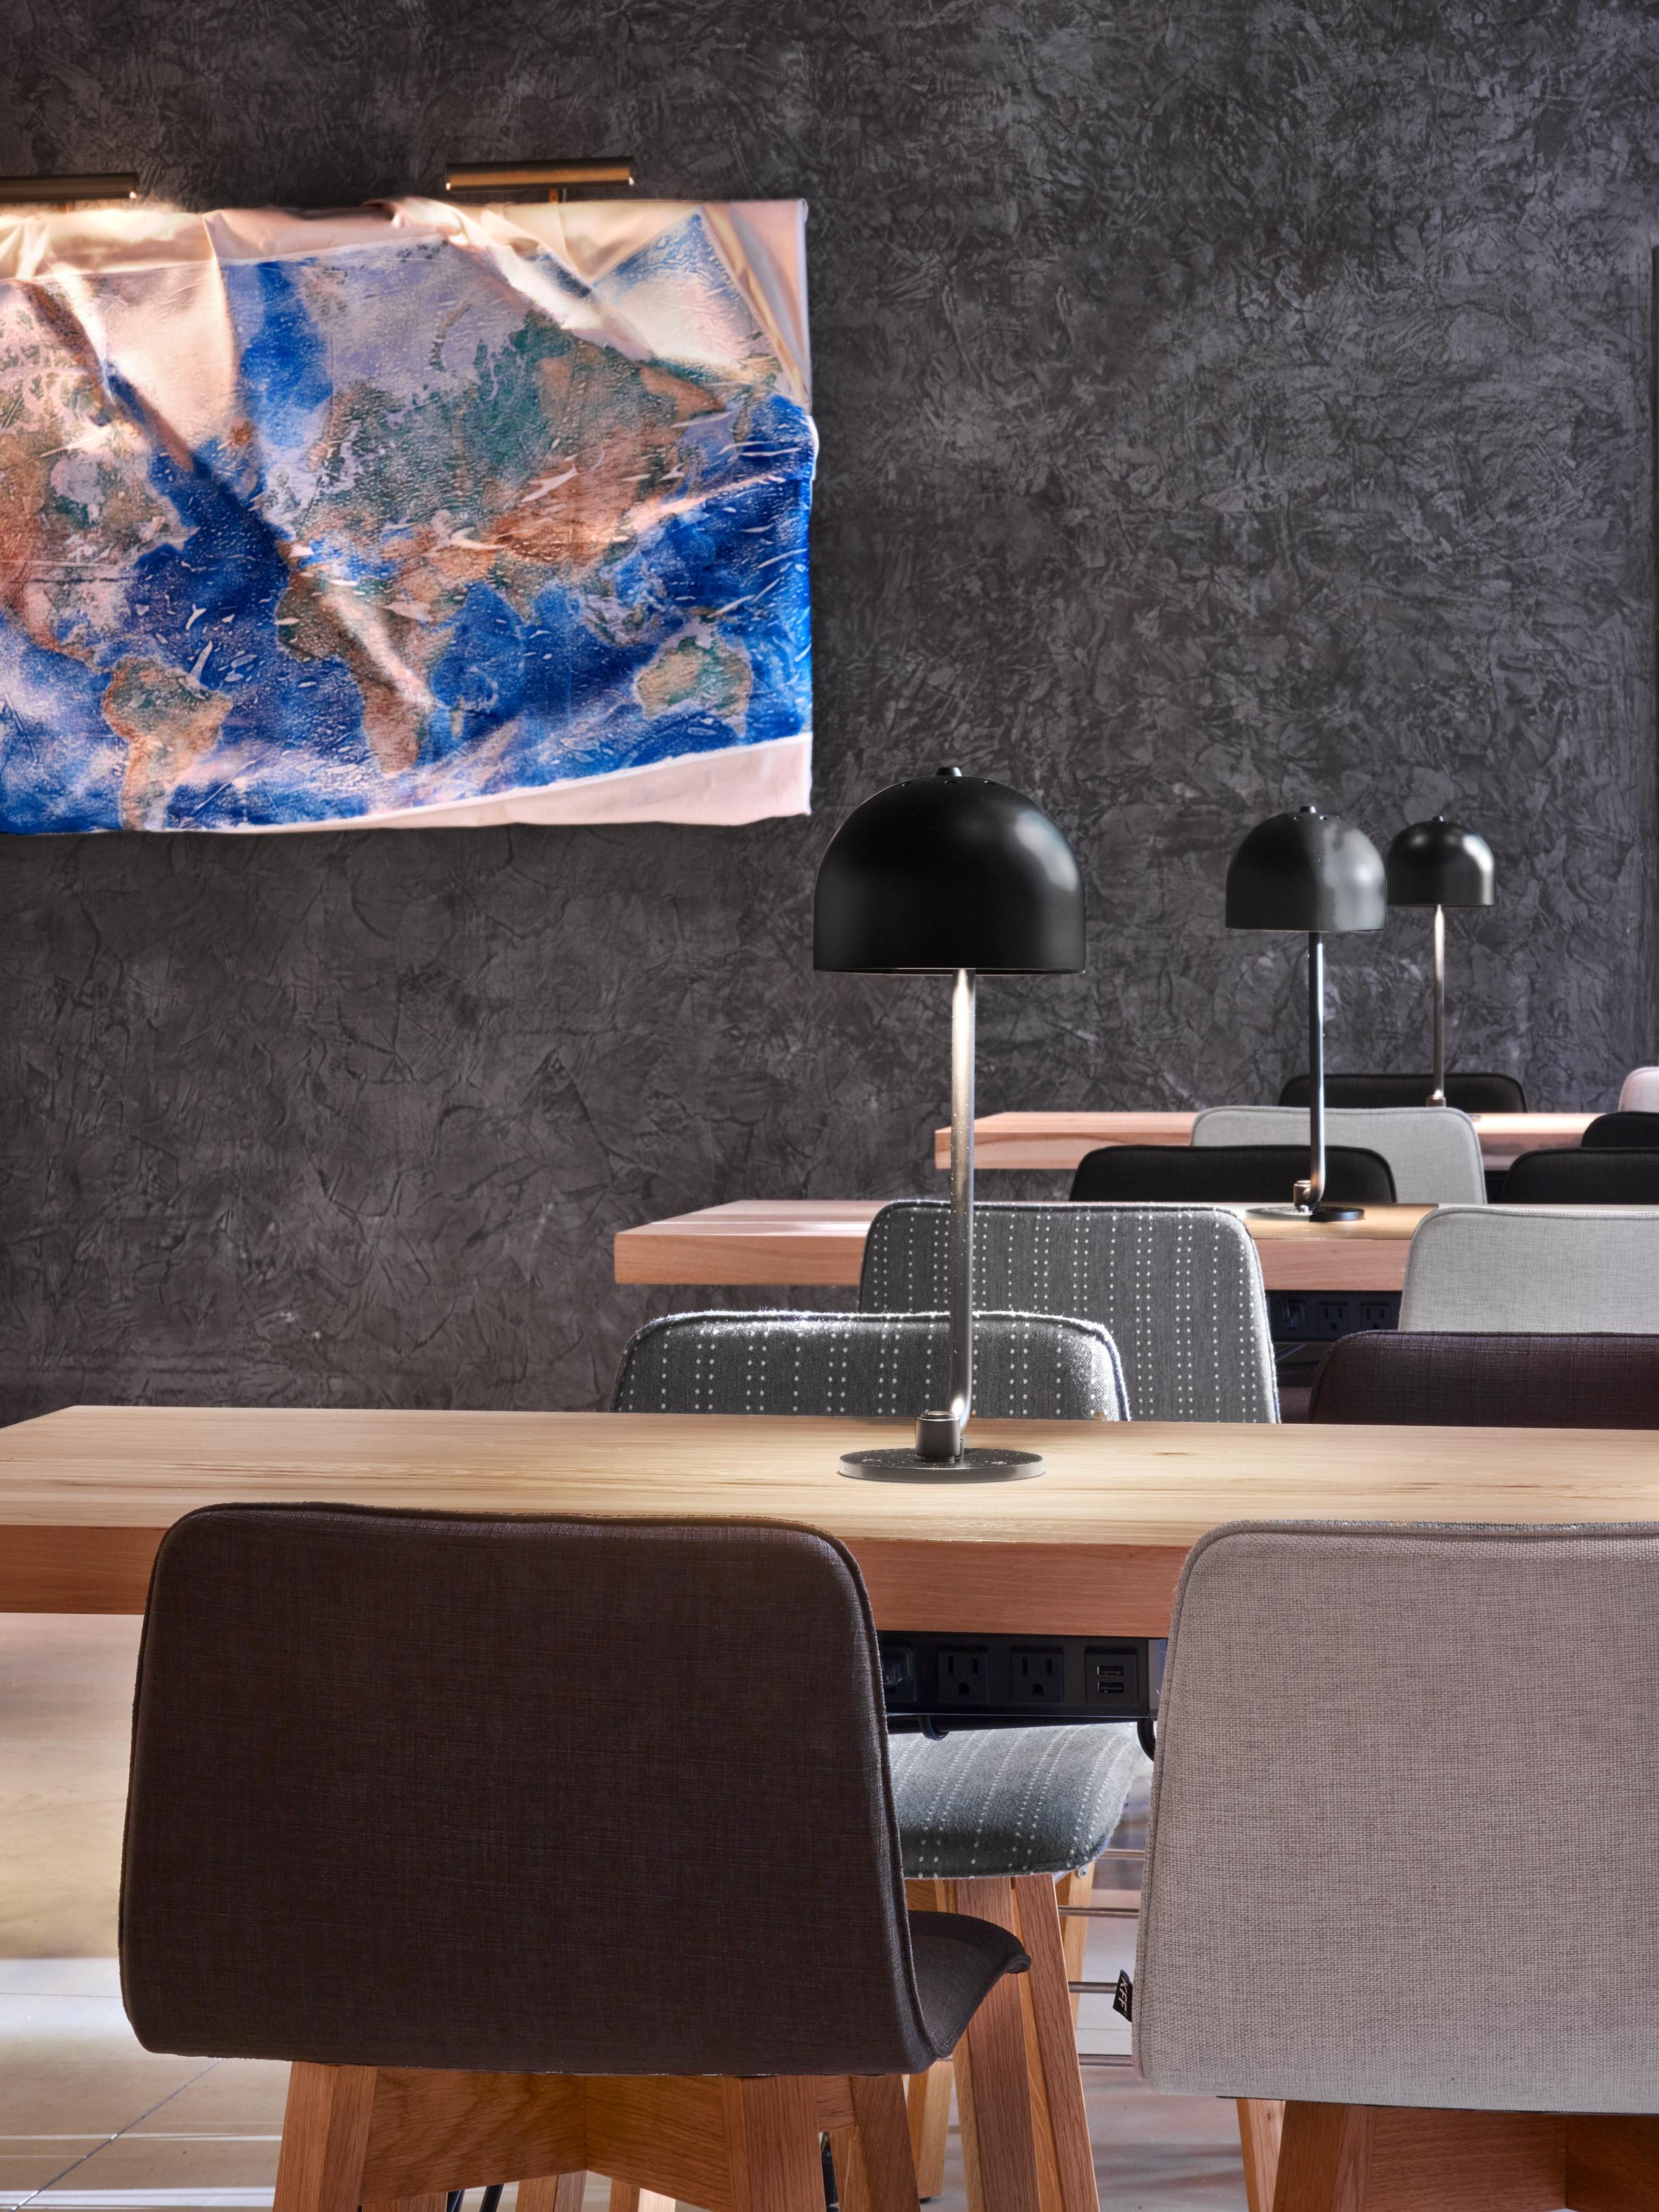 architecture-new-york-city-micro-hotel-design-studia-interiors-osnovadesign-osnova-poltava_19